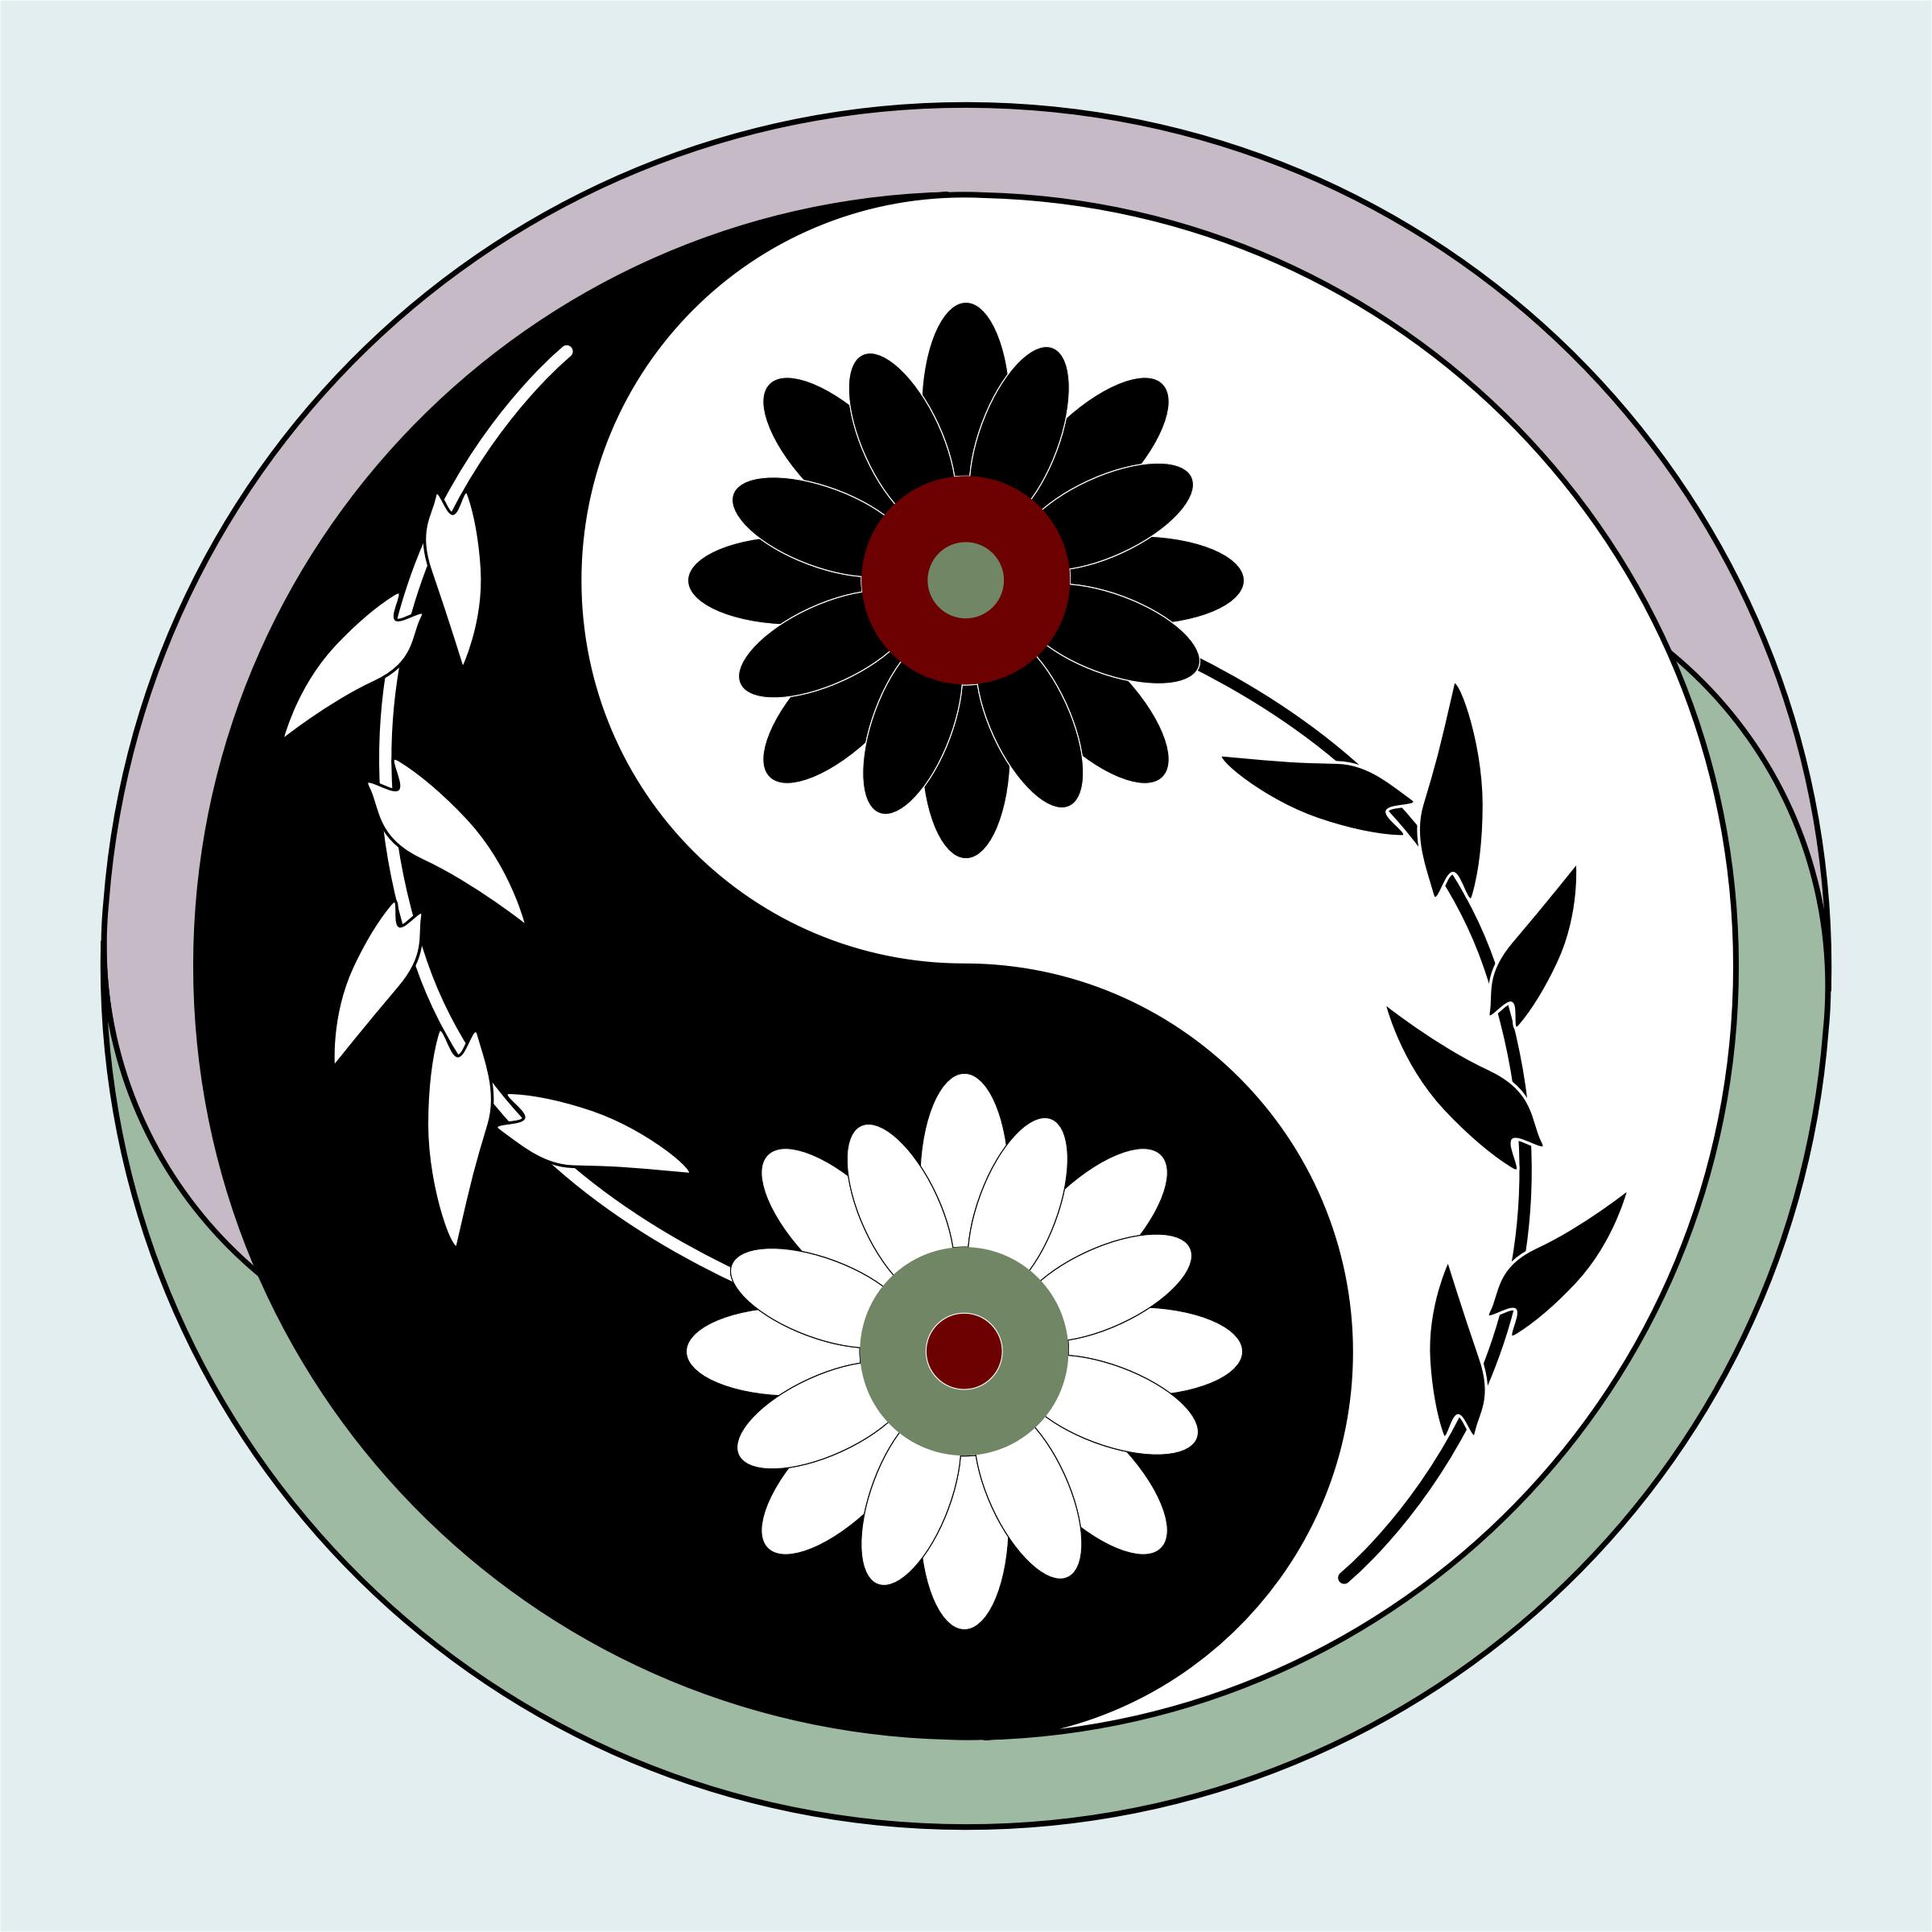 Clipart Yin Yang Flower